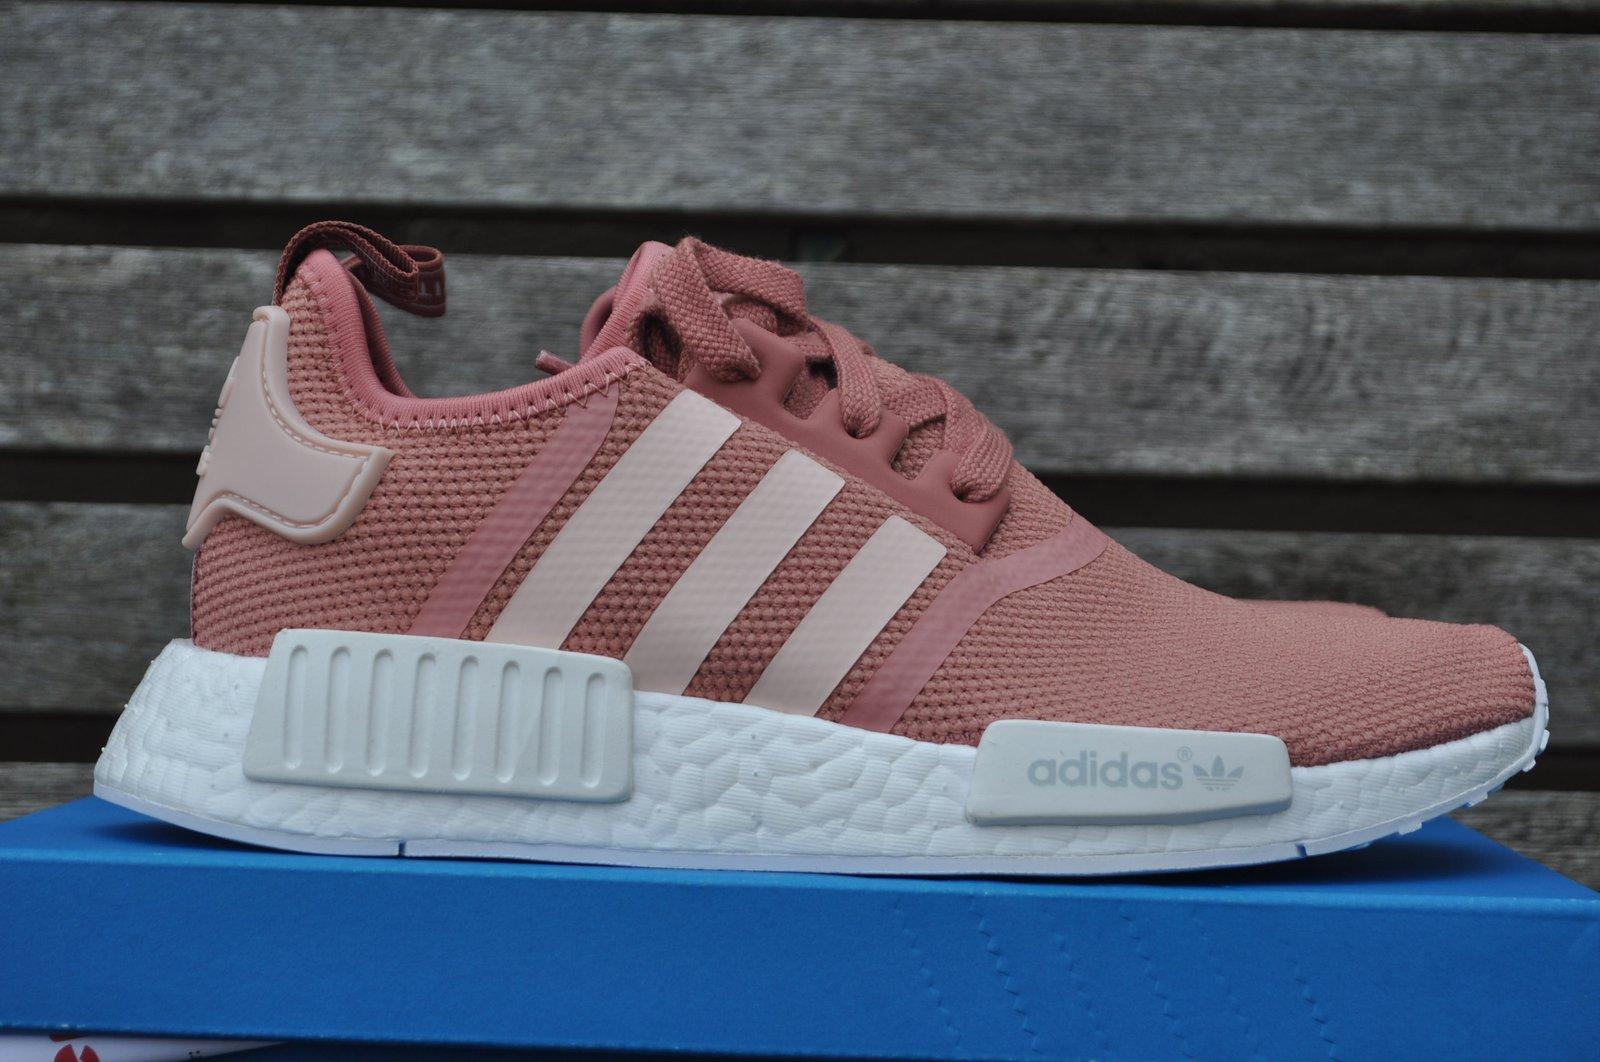 new styles 53998 706bf adidas NMD Runner Womens Salmon Pink UK5 US6.5 EU38 BNWB RARE